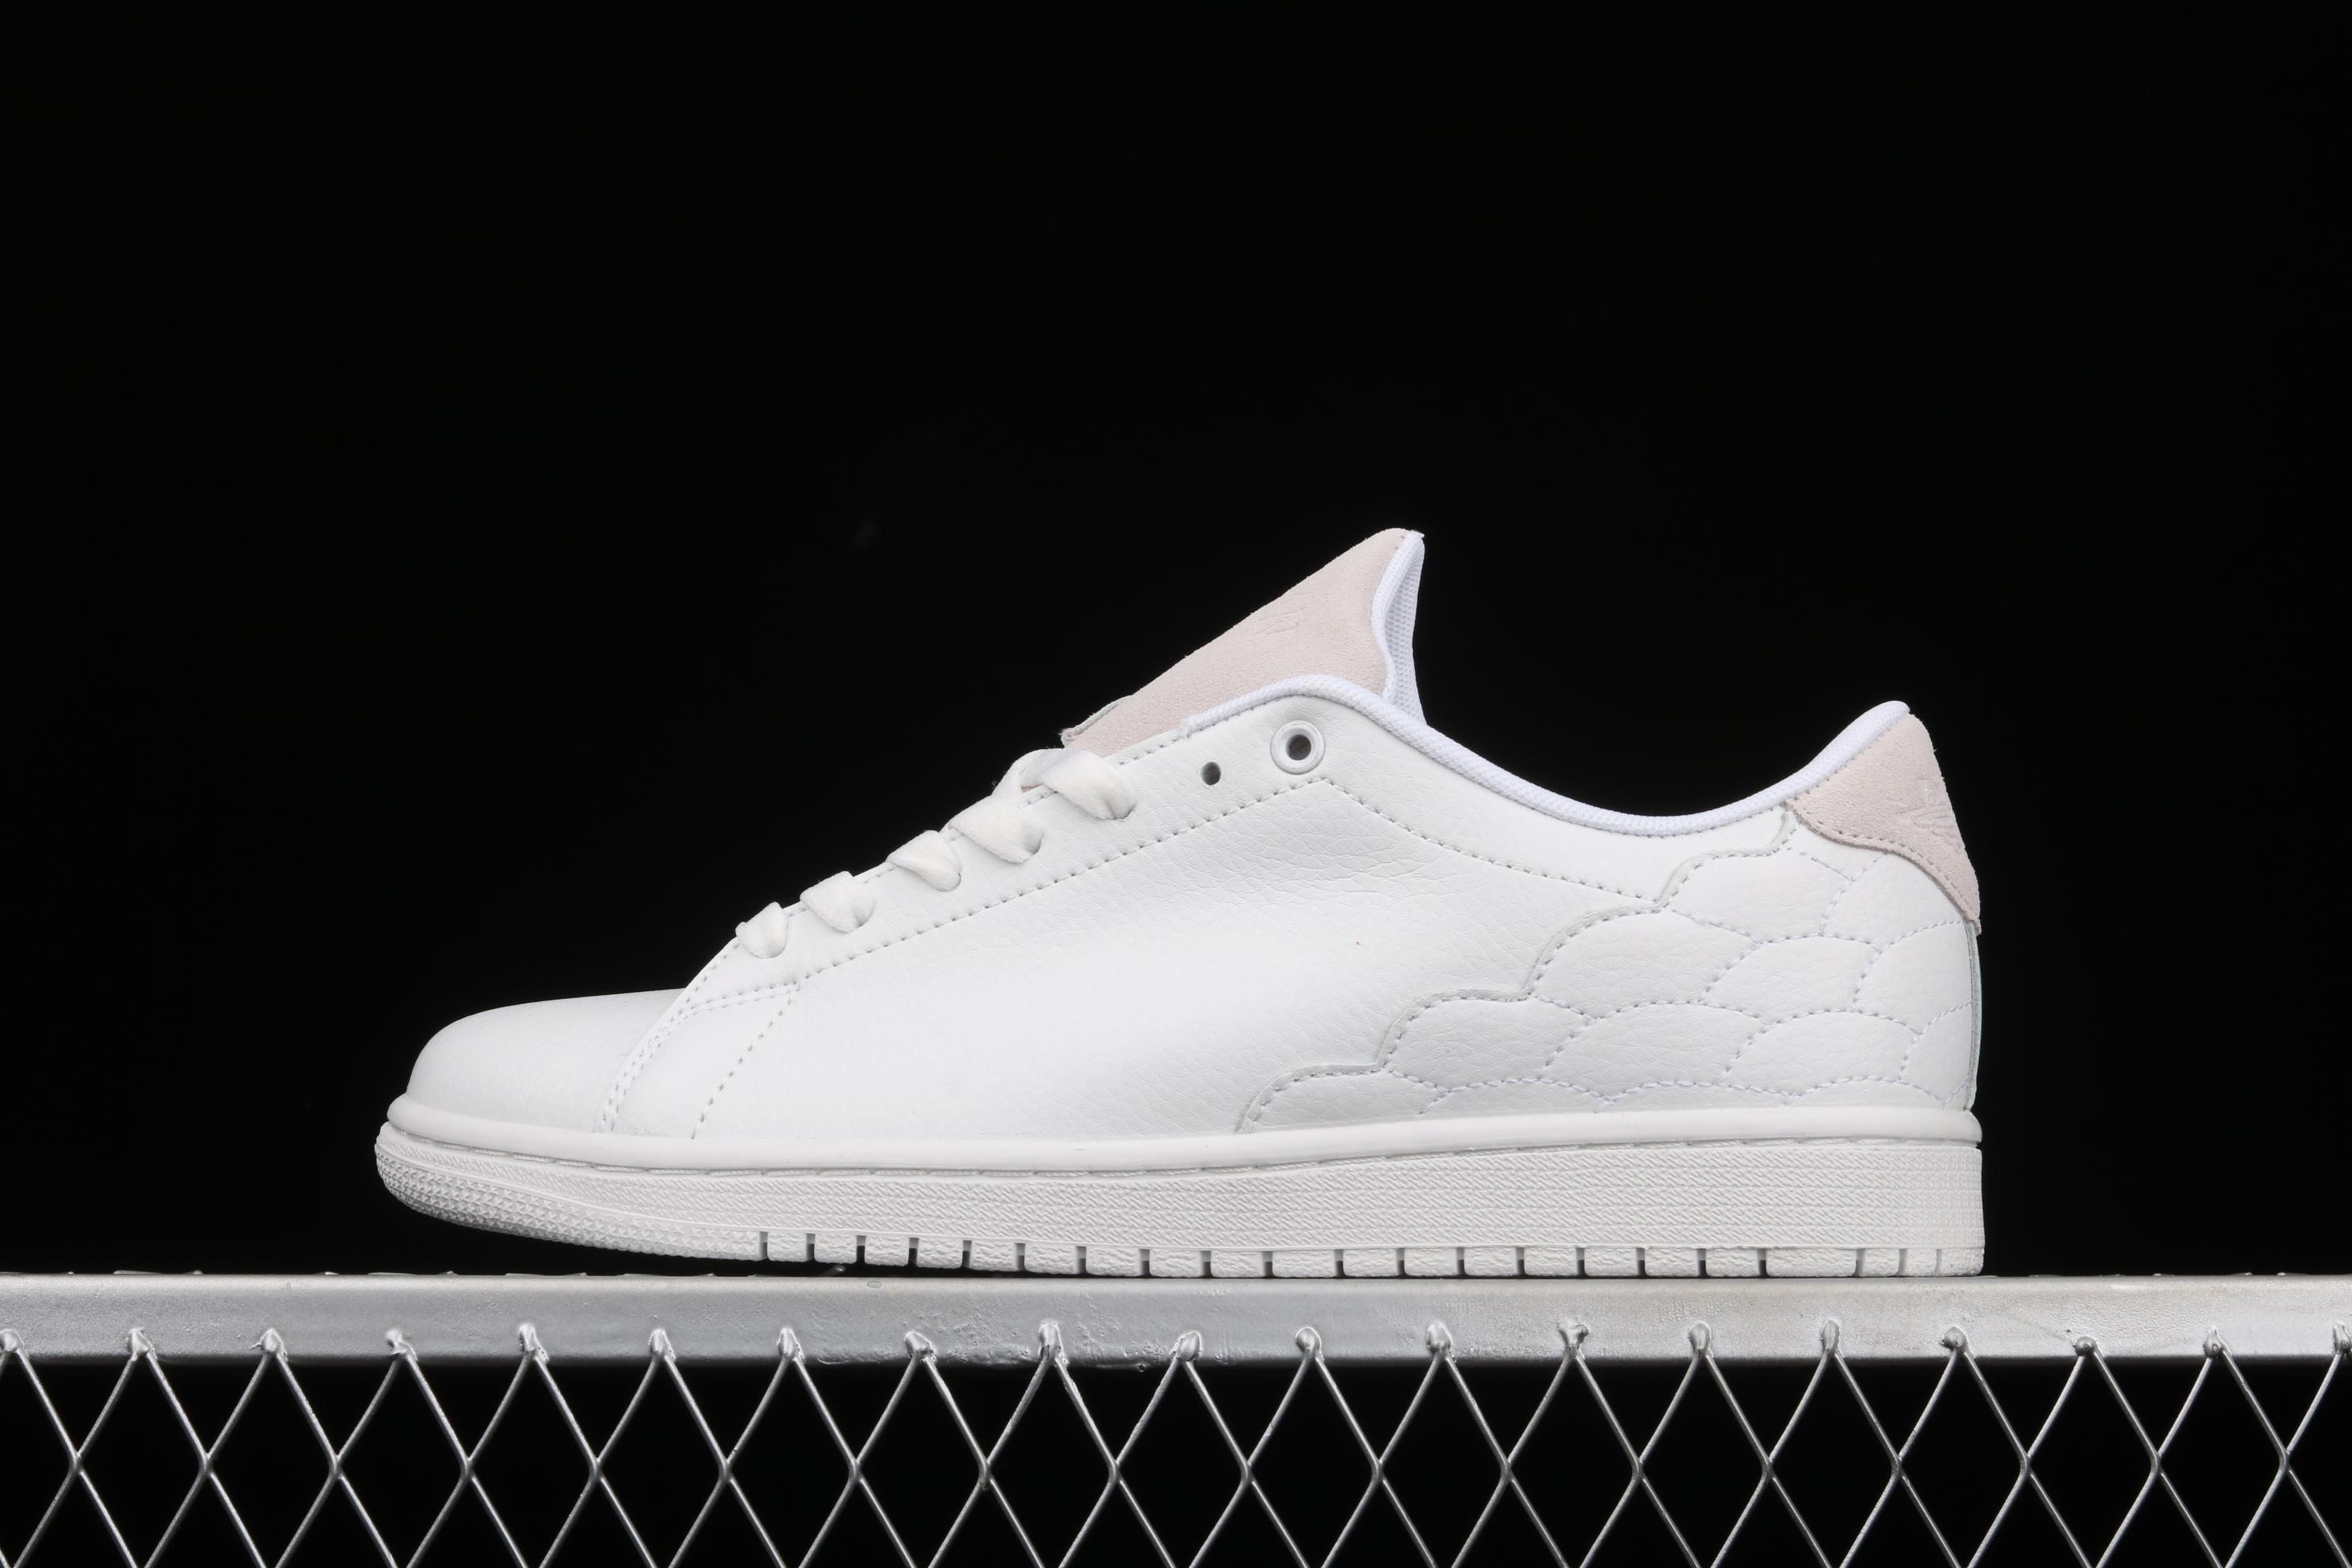 Air Jordan 1 Center Court AJ1 乔1灰白低帮板鞋 DJ2756-100